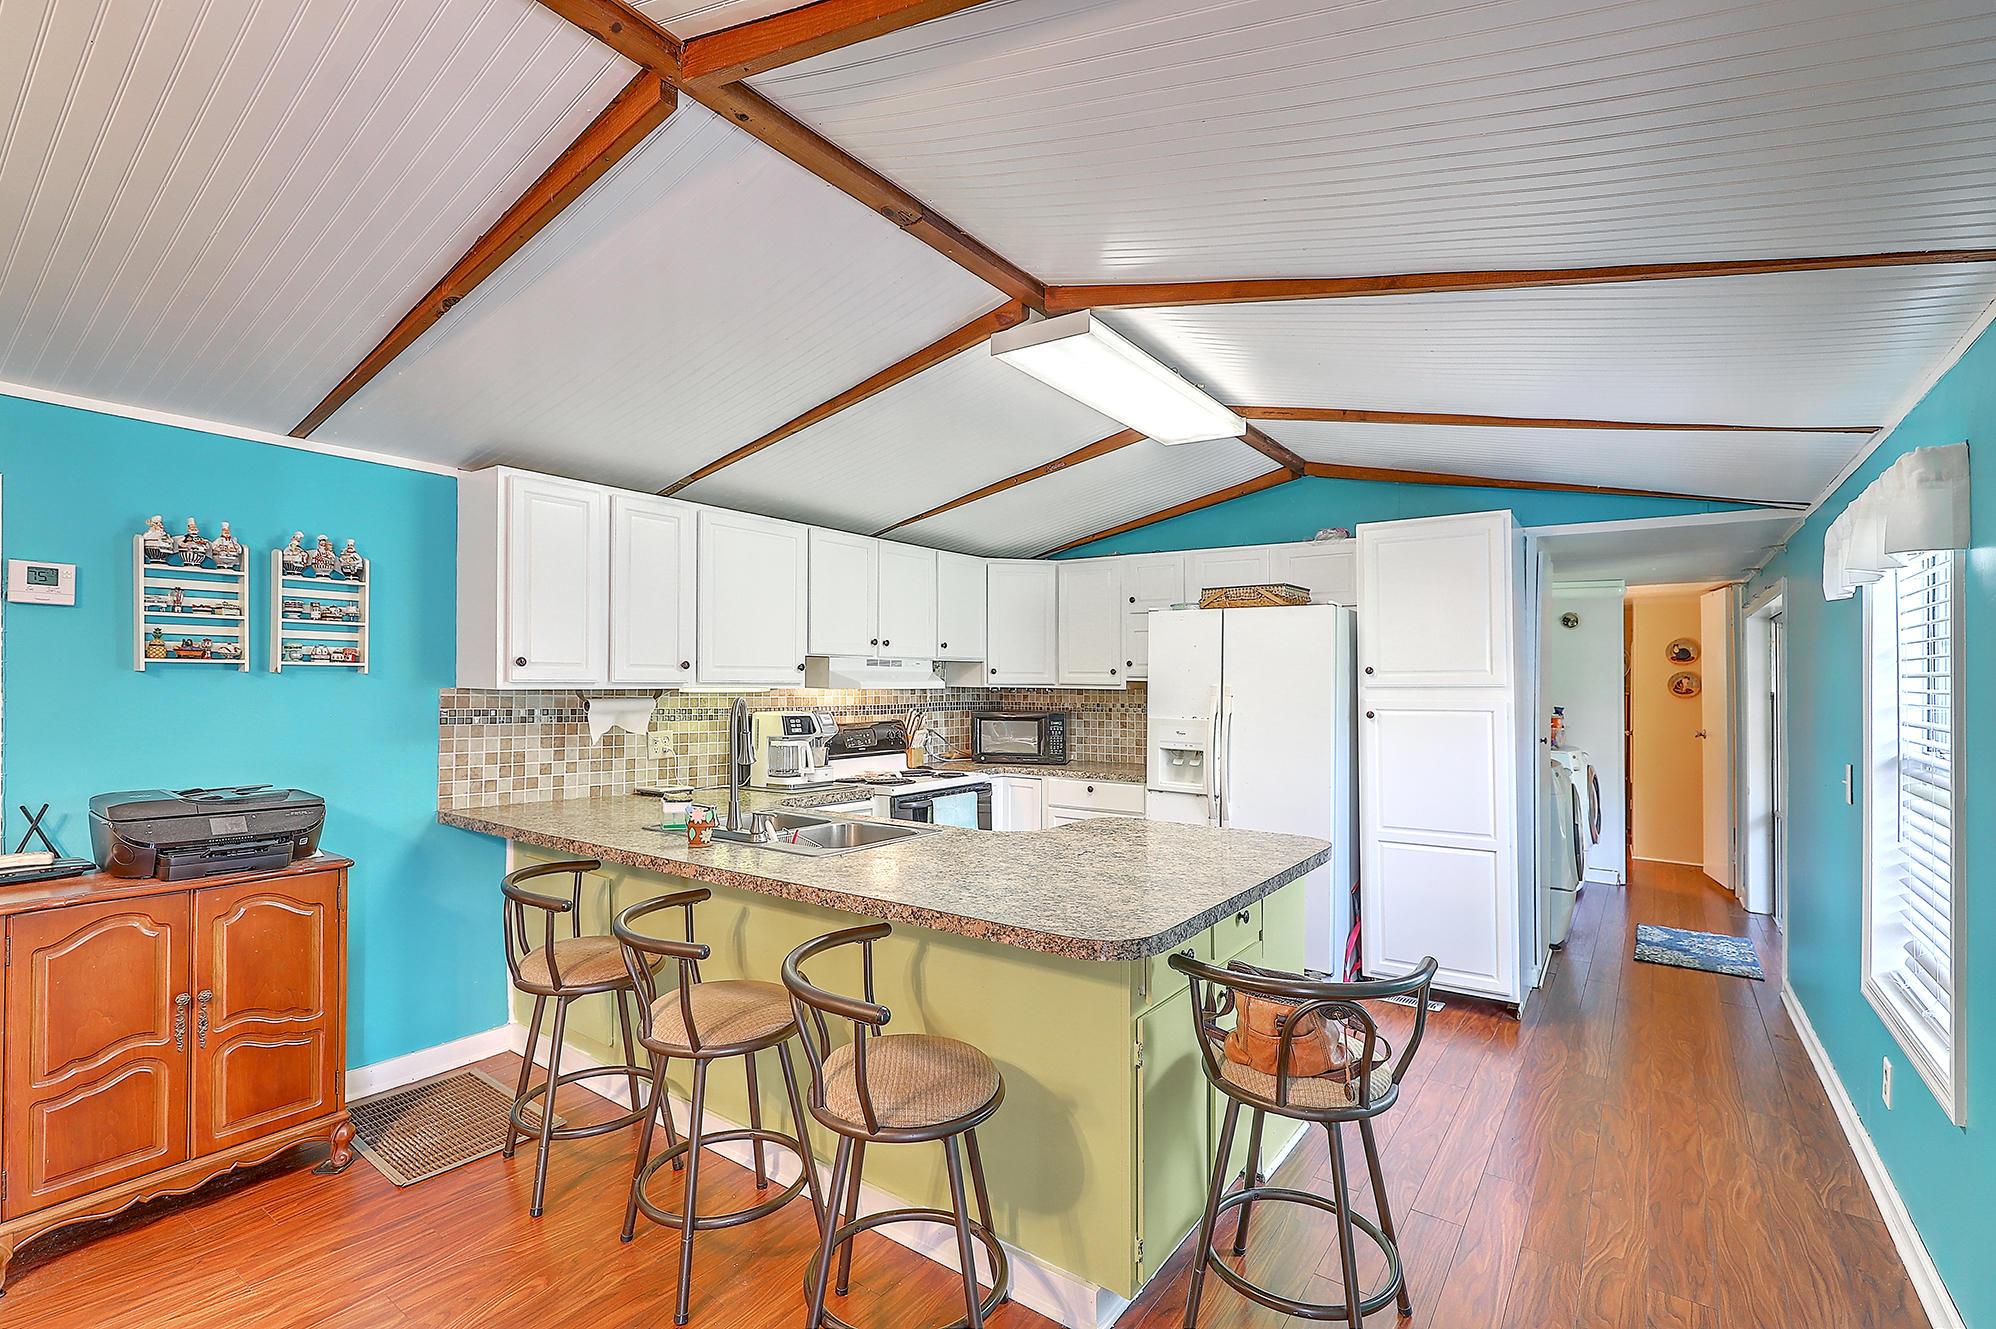 Cross Area (West) Homes For Sale - 128 Cherry Grove, Cross, SC - 38